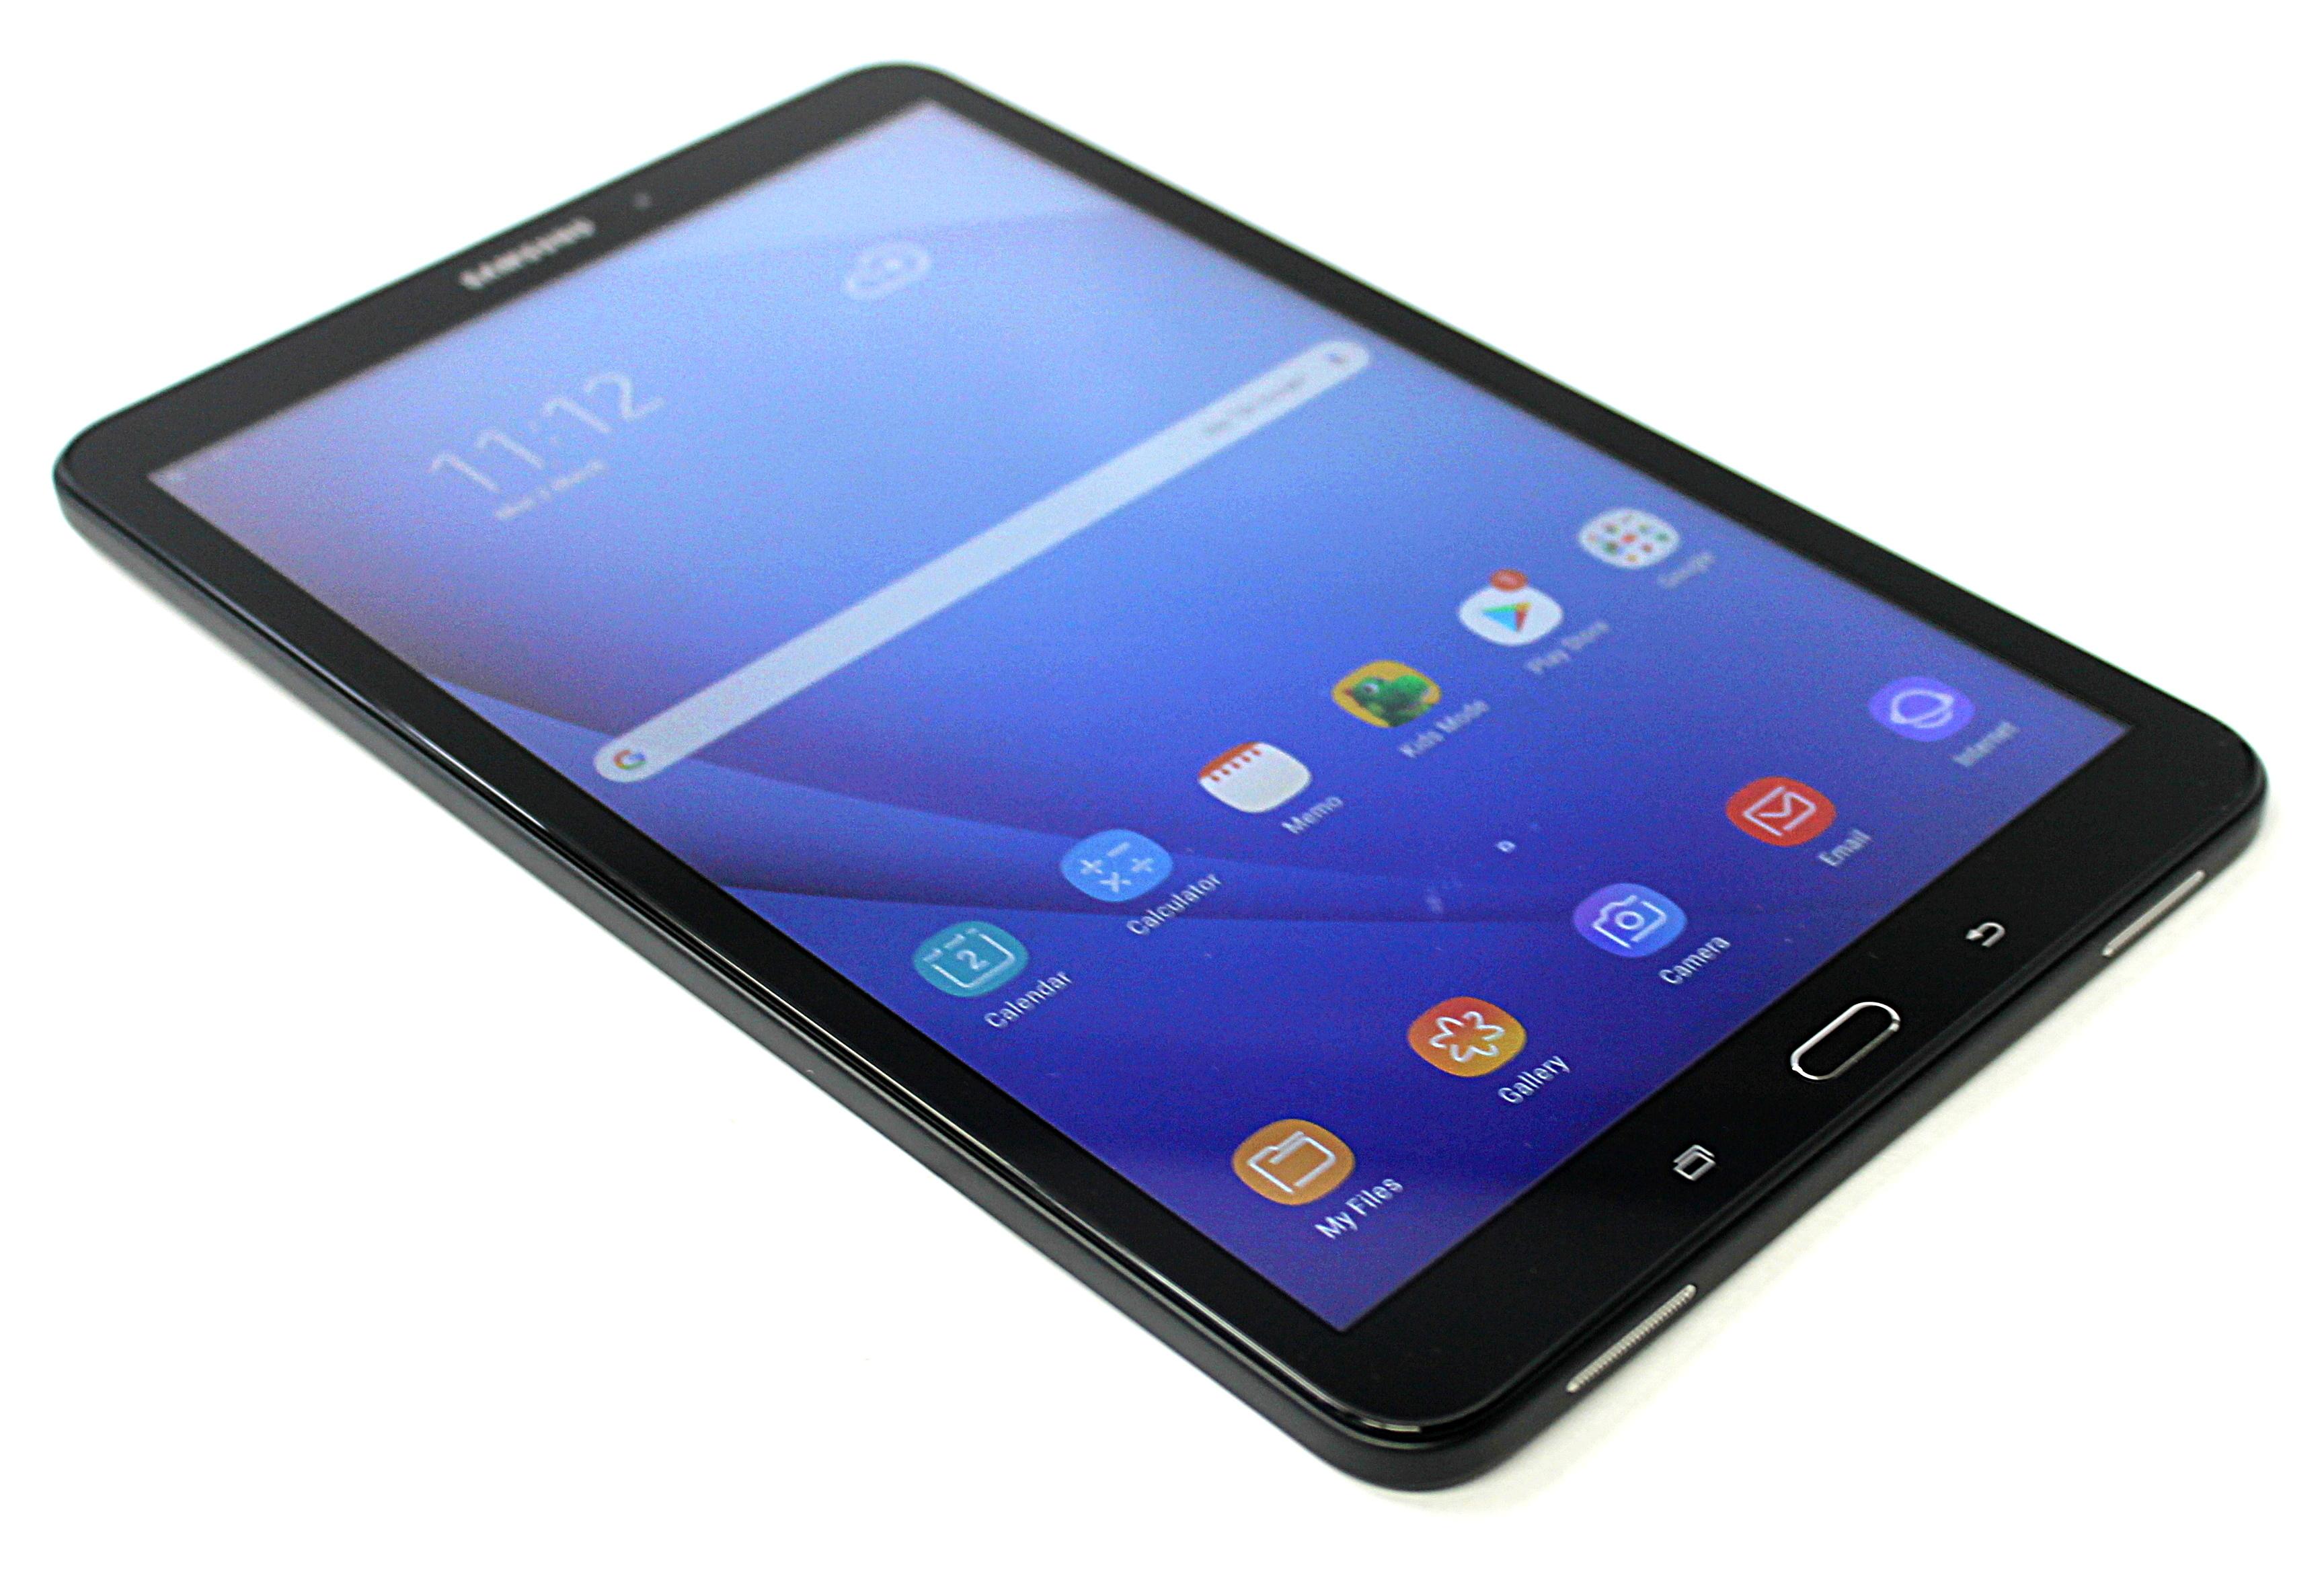 Samsung Galaxy Tab A 10.1 SM-T580 32GB Metallic Black Refurbished